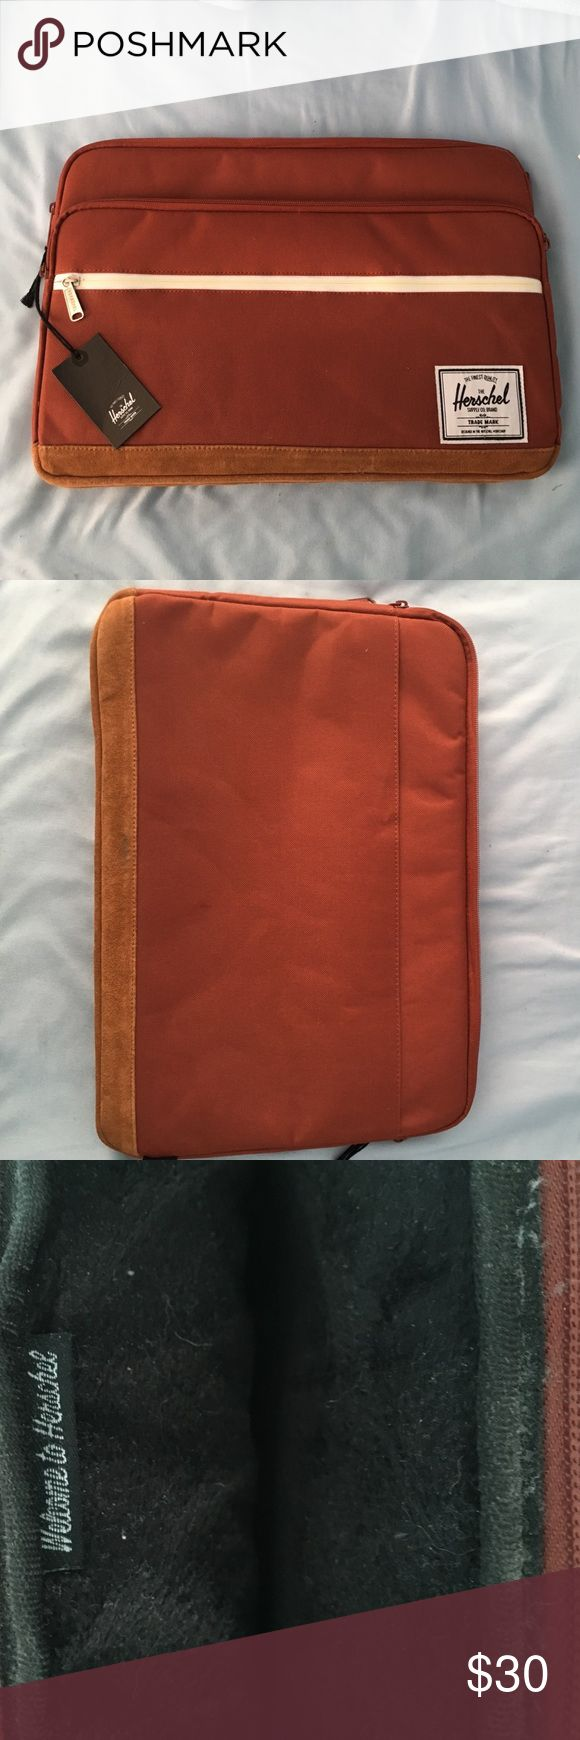 15 inch Herschel Laptop Sleeve 15 inch laptop case never used, 3 zipper compartments Herschel Supply Company Accessories Laptop Cases